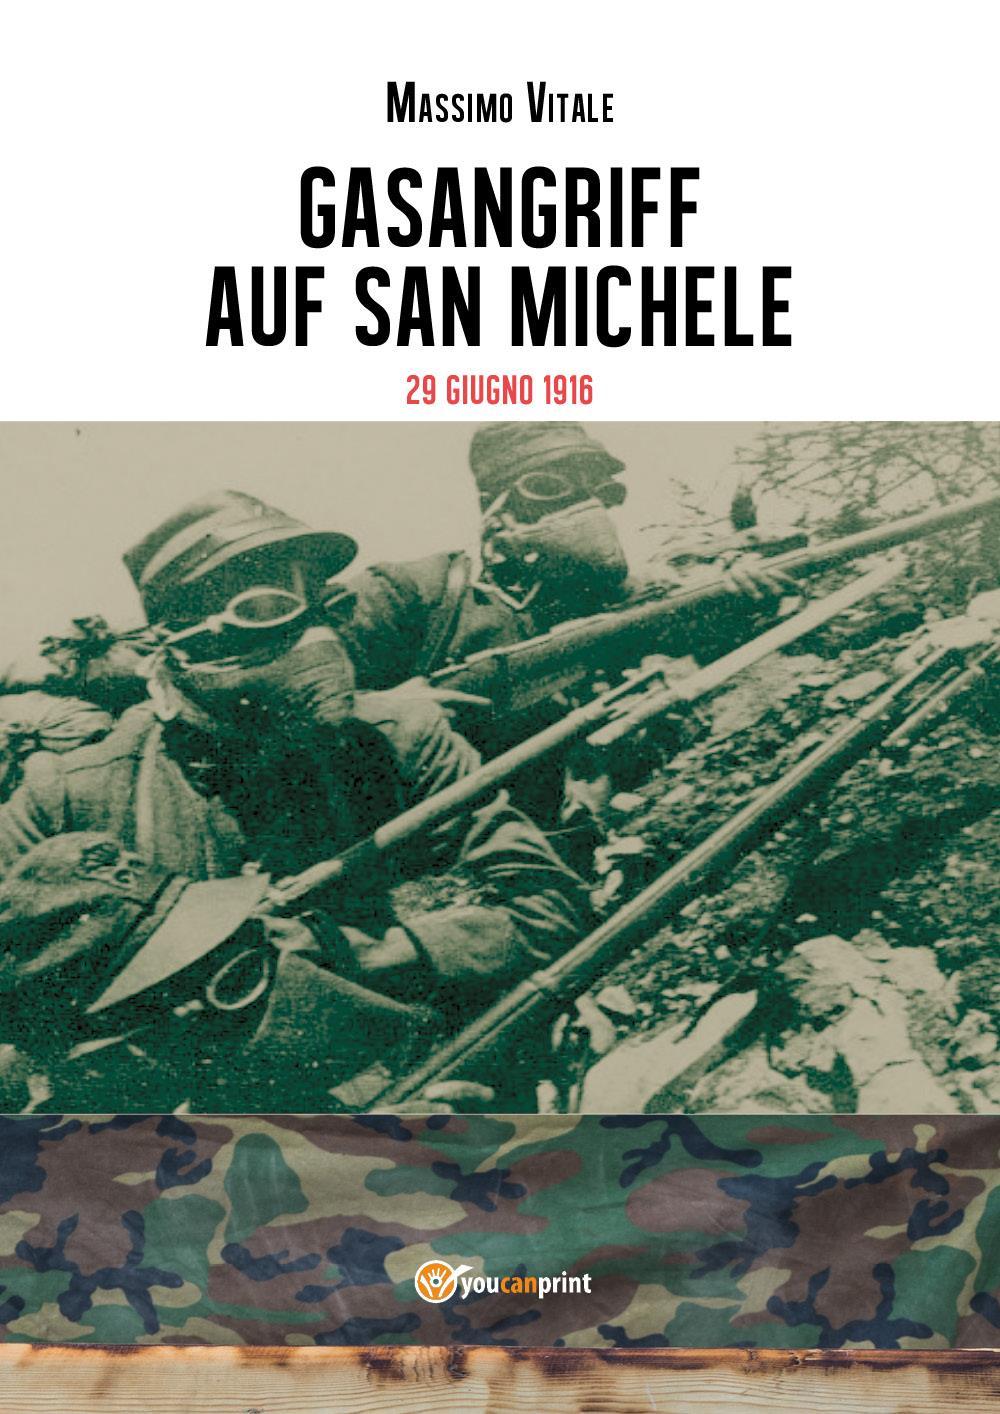 Gasangriff auf San Michele - 29 giugno 1916